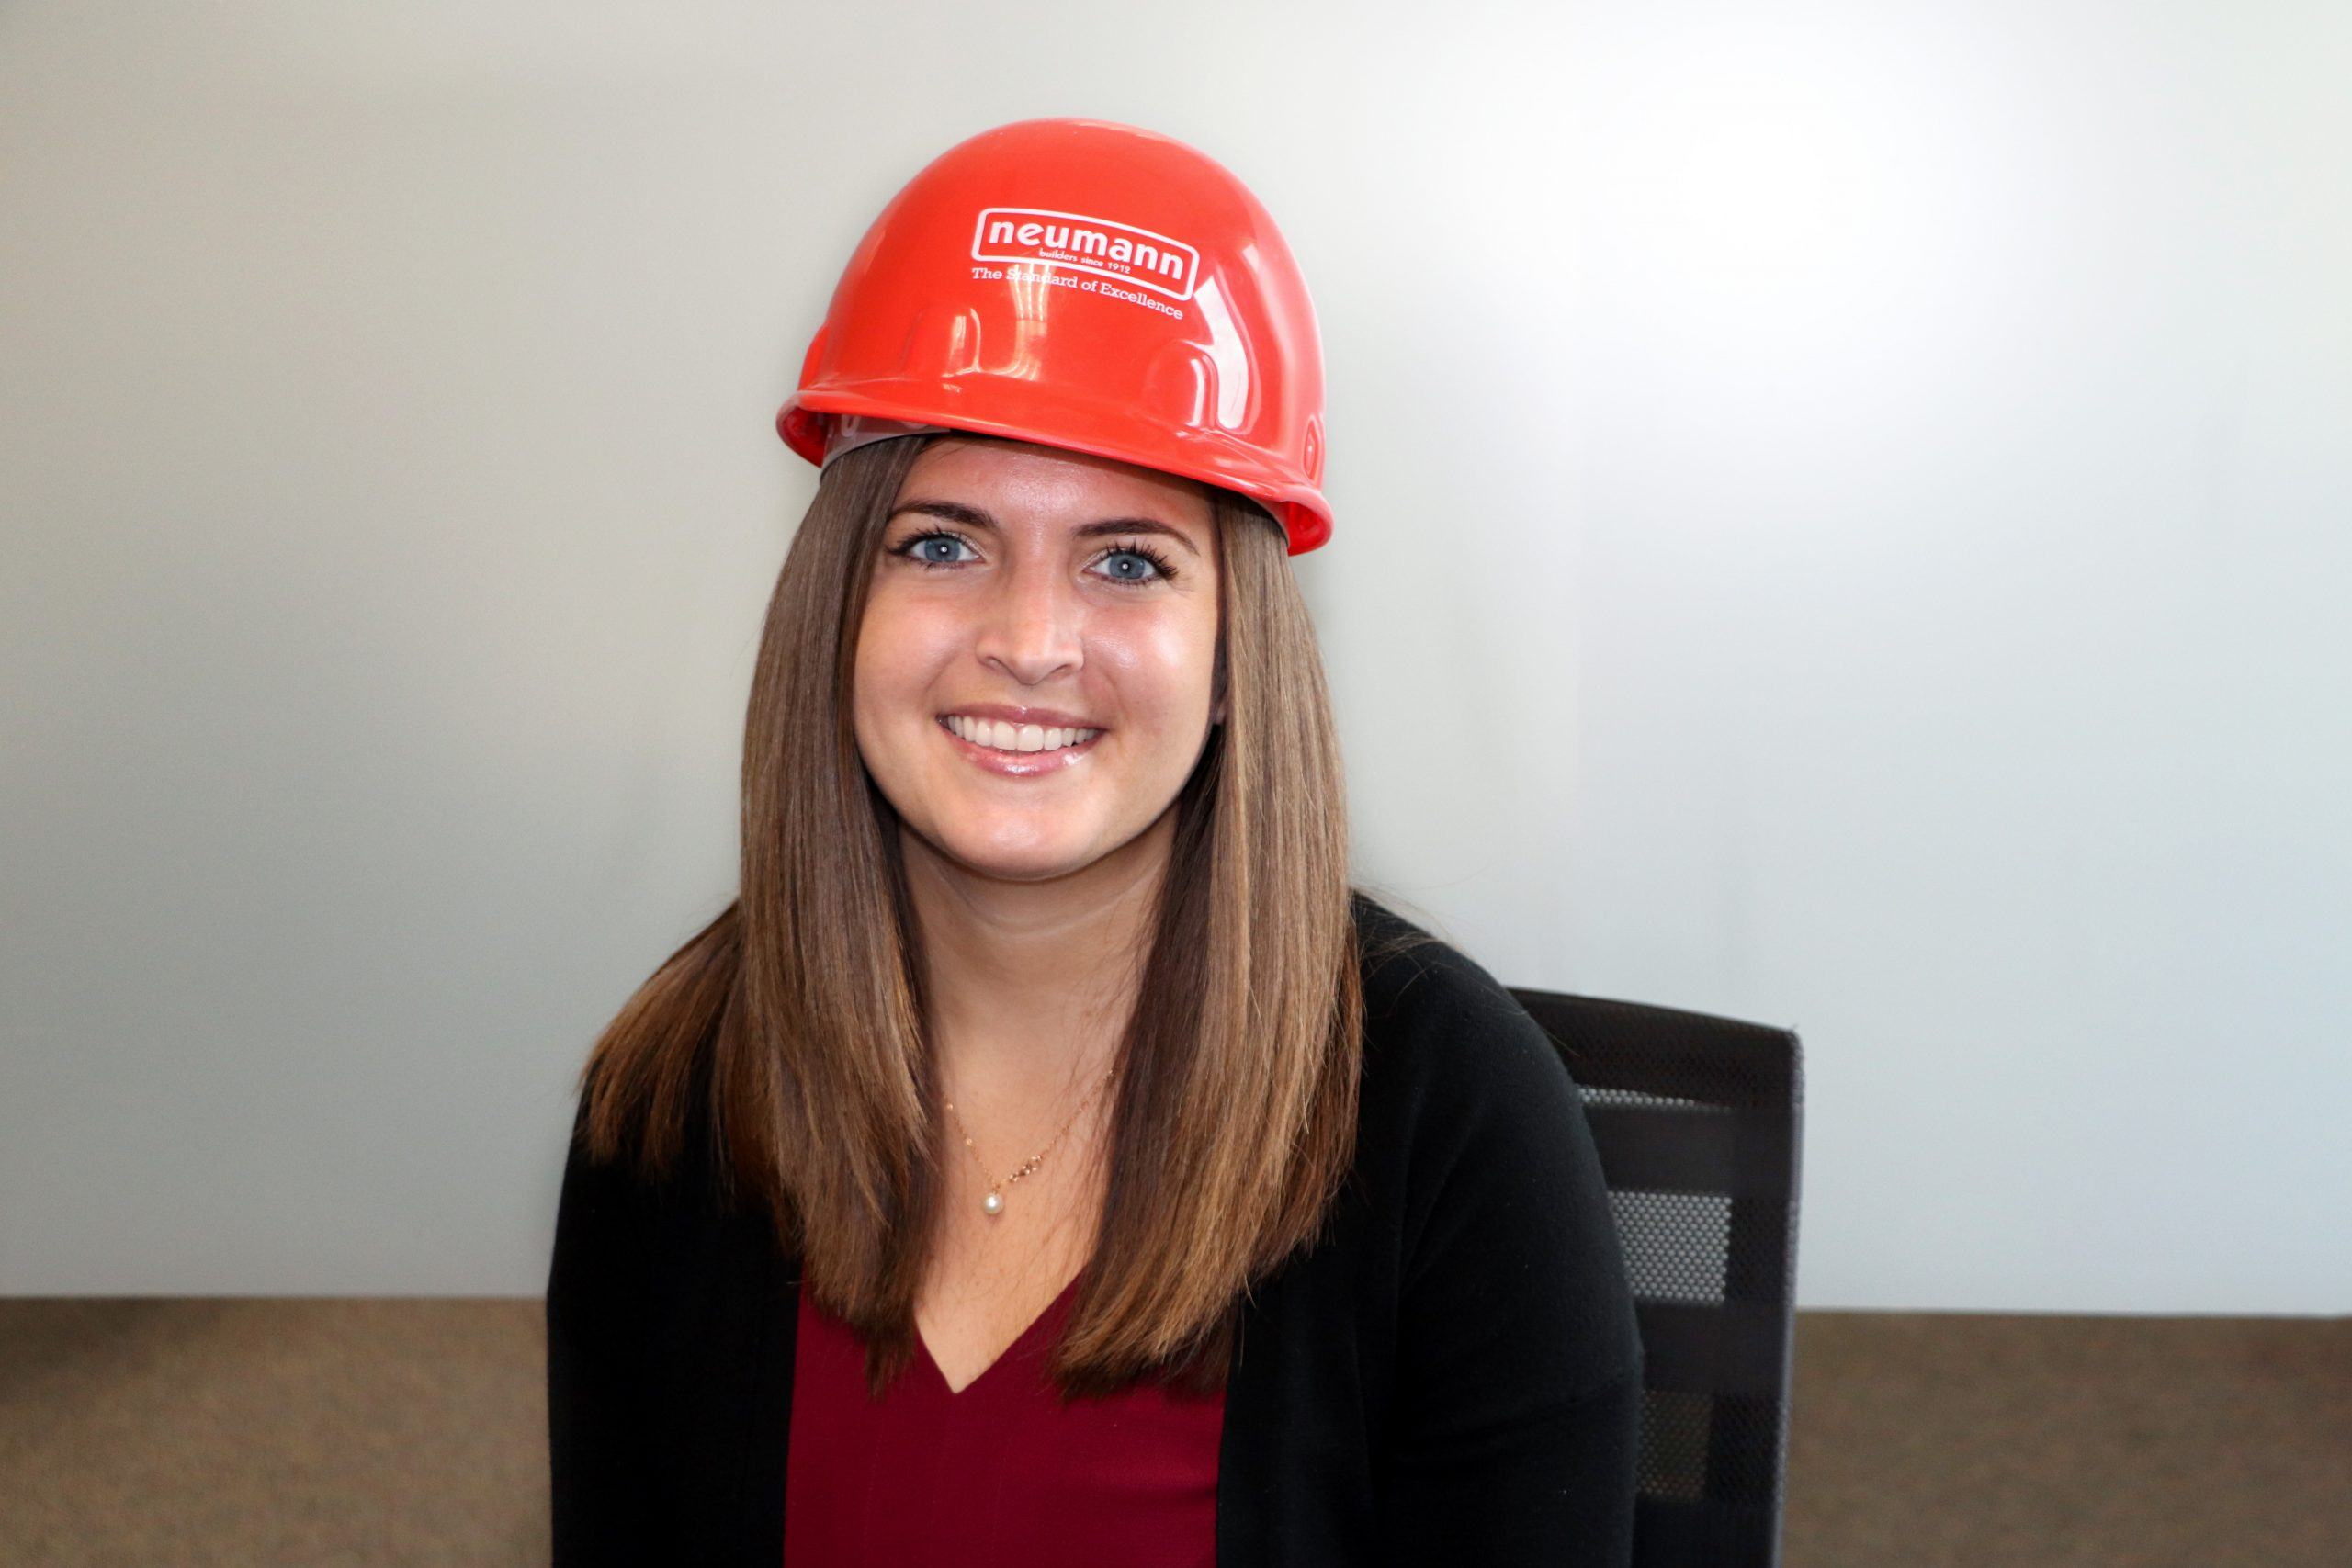 Project Accountant: Elizabeth Ikeler